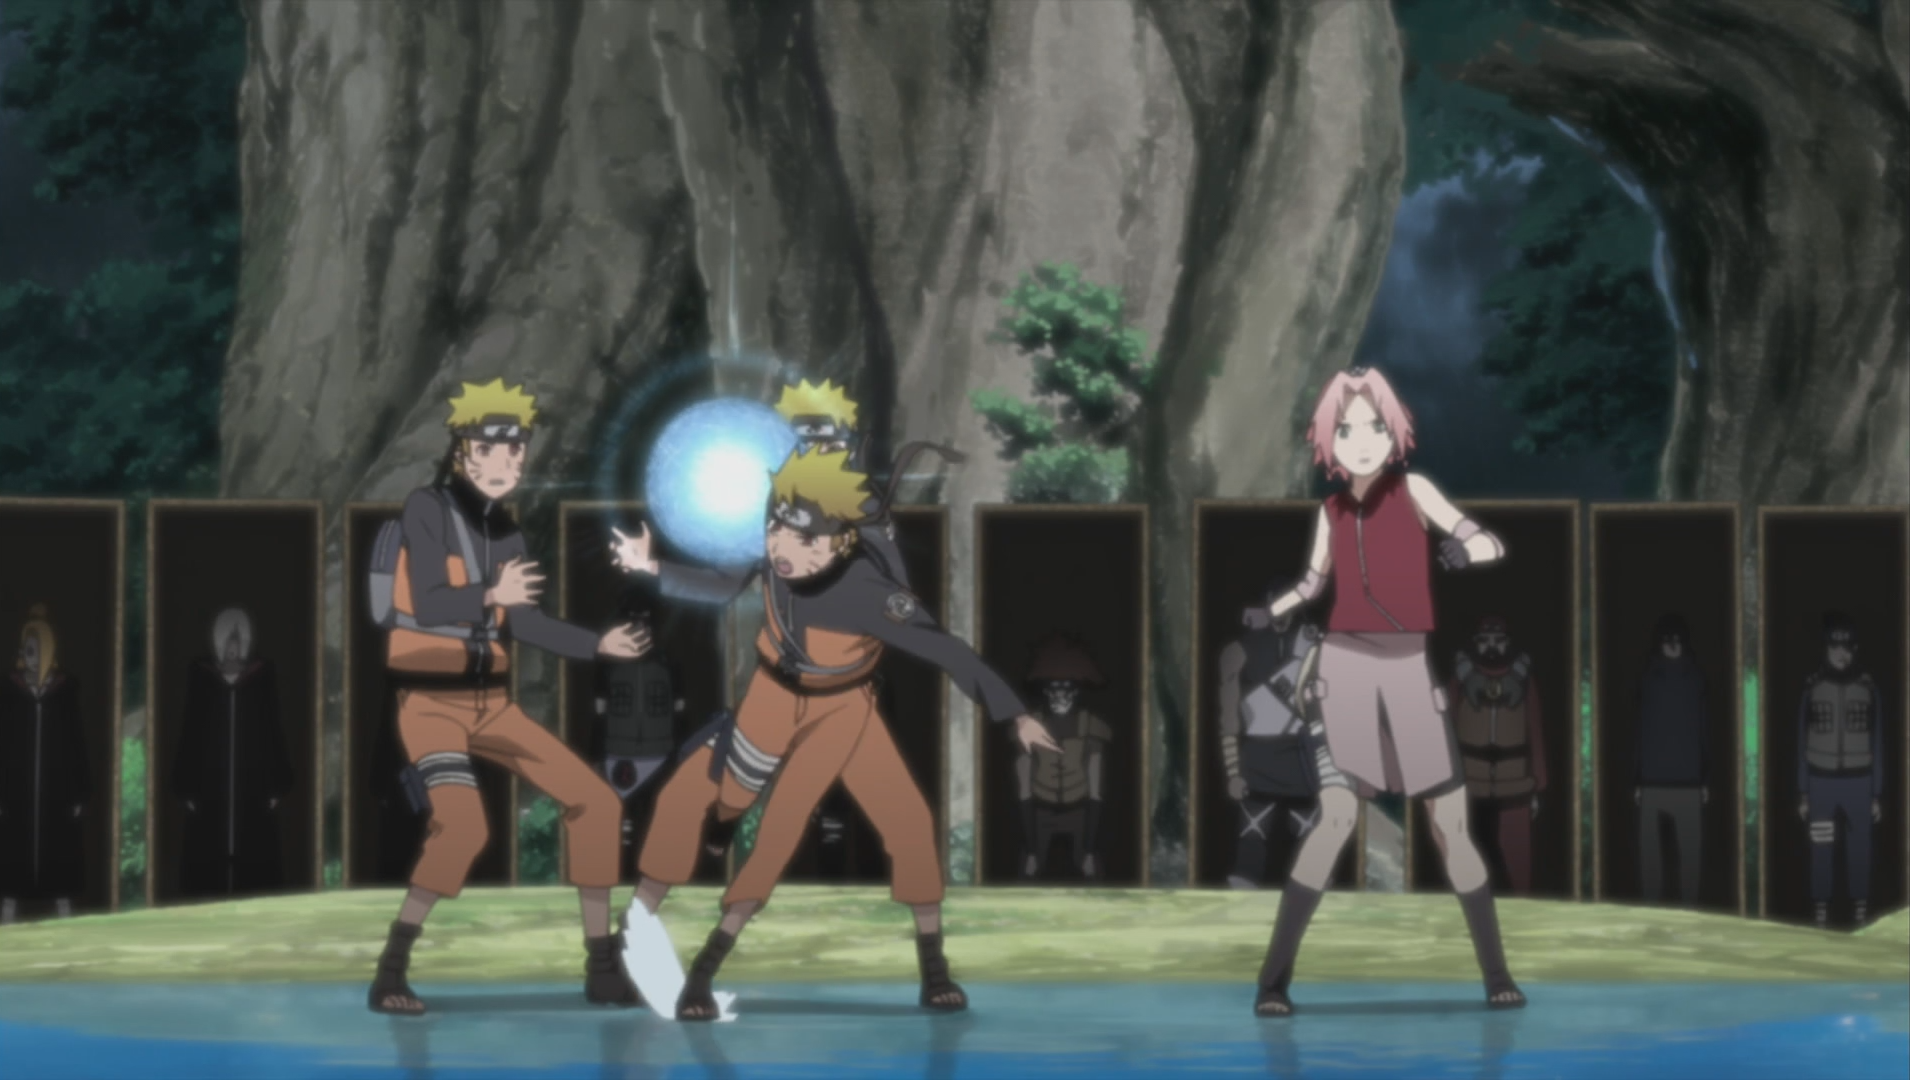 Power - Episode 1 | Narutopedia | FANDOM powered by Wikia